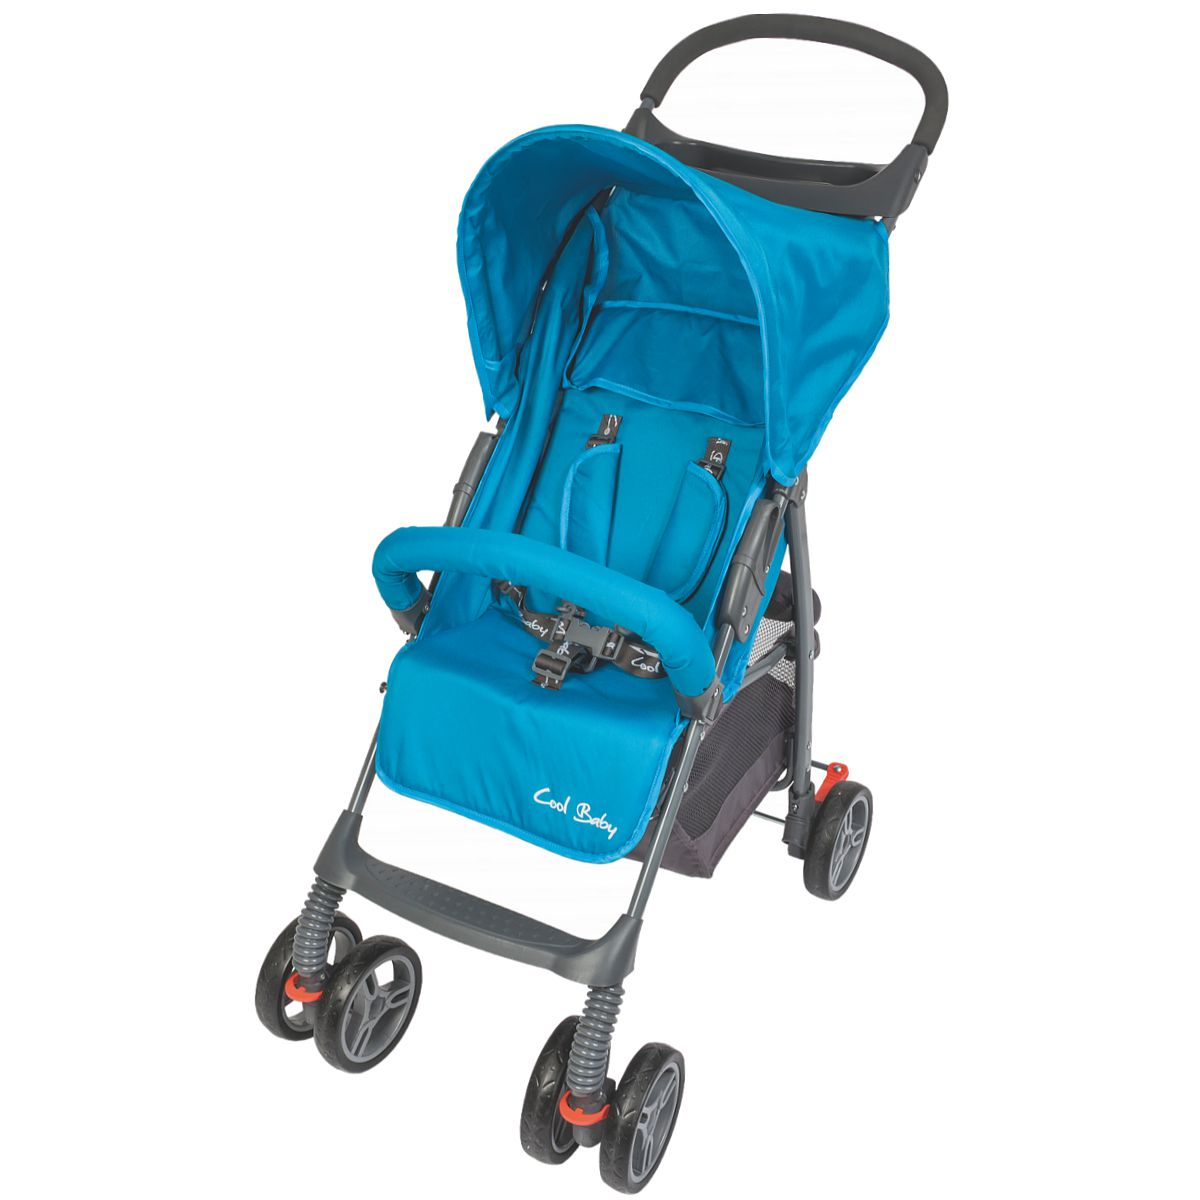 kinderwagen buggy shopper sportwagen jogger babywagen kindersportwagen jimmy neu. Black Bedroom Furniture Sets. Home Design Ideas